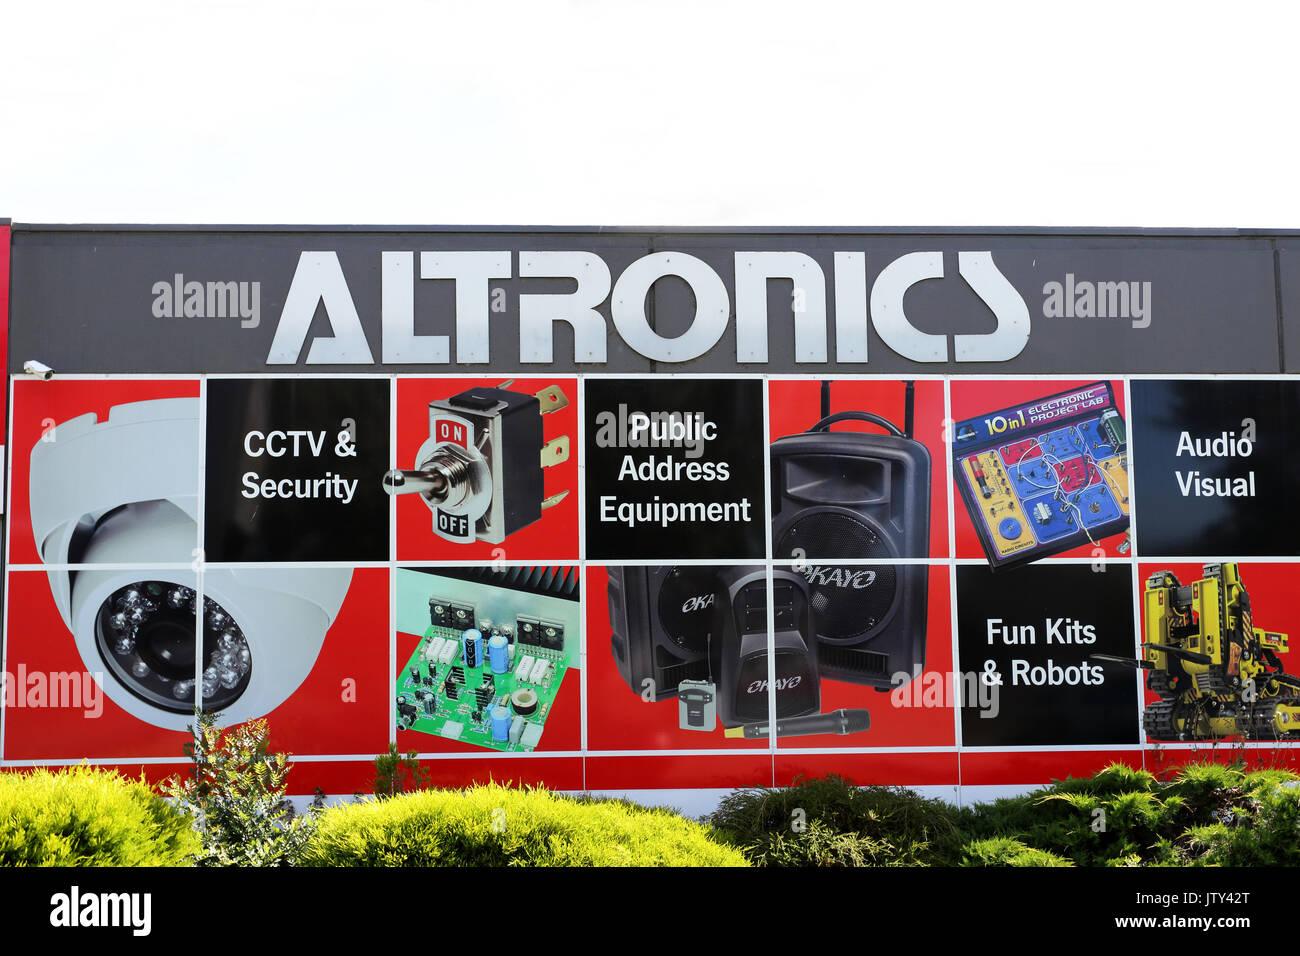 Electronic Manufacturer Stock Photos & Electronic